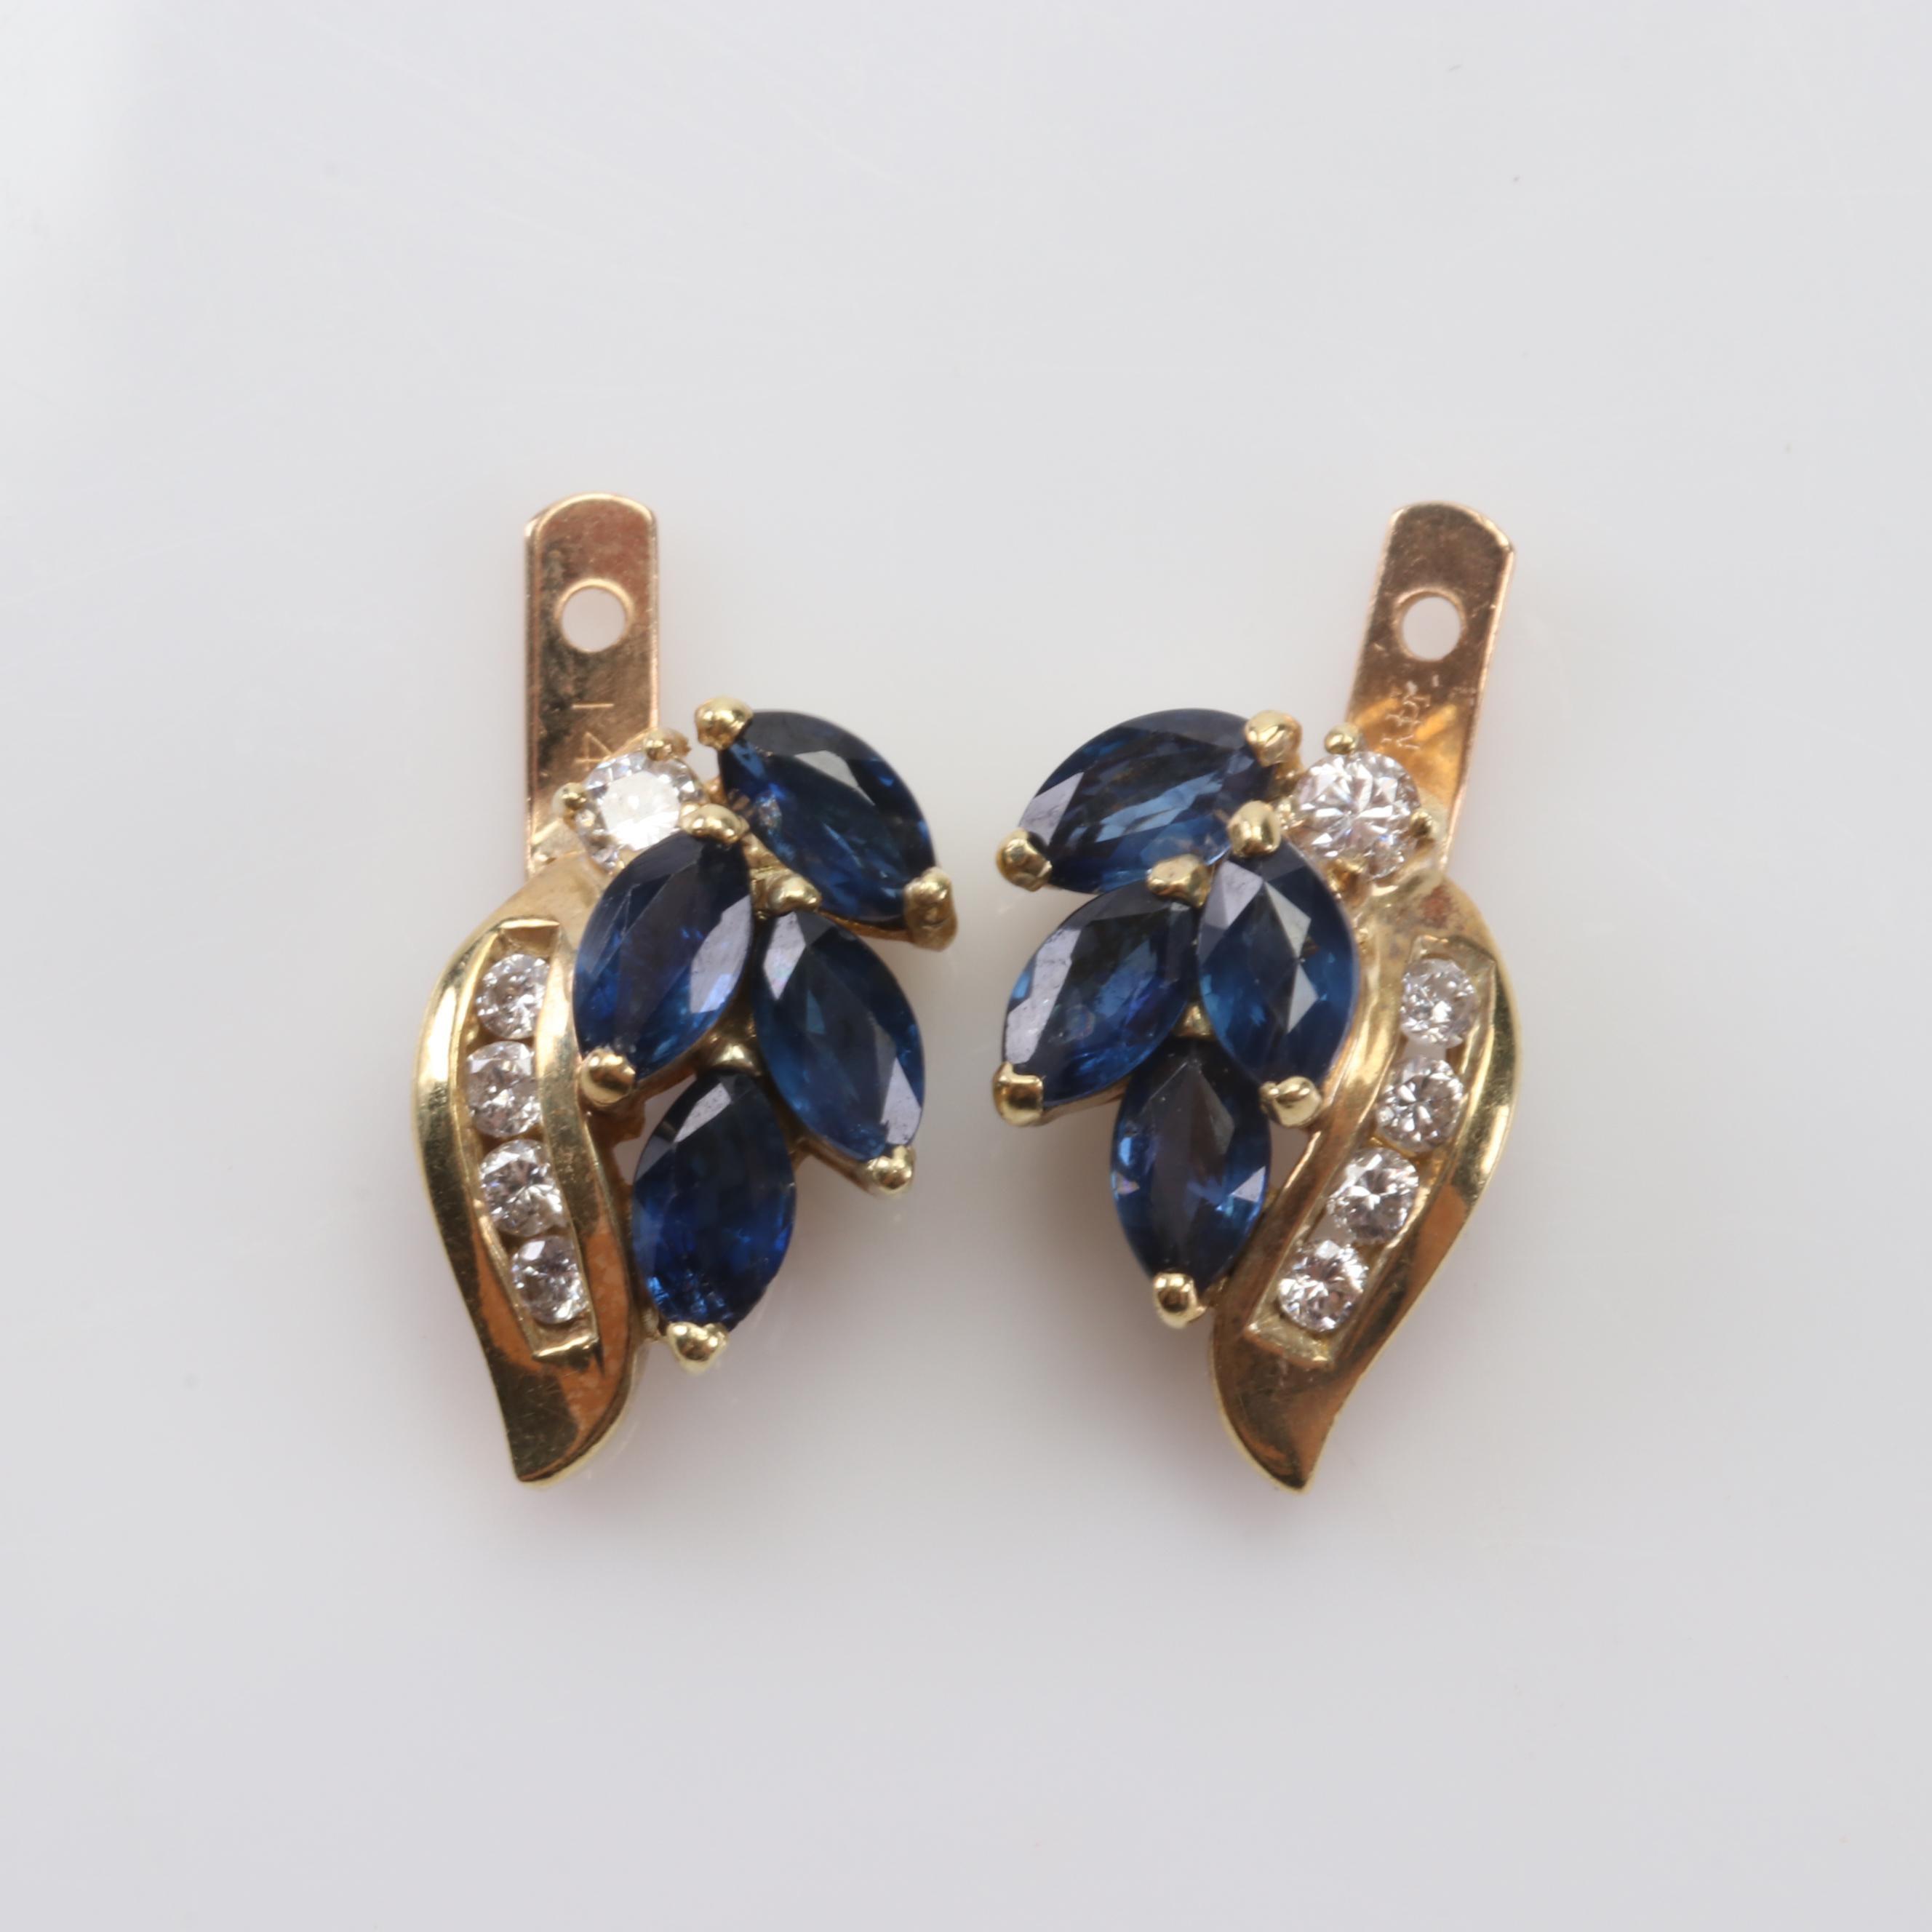 14K Yellow Gold Sapphire And Diamond Earring Jacket